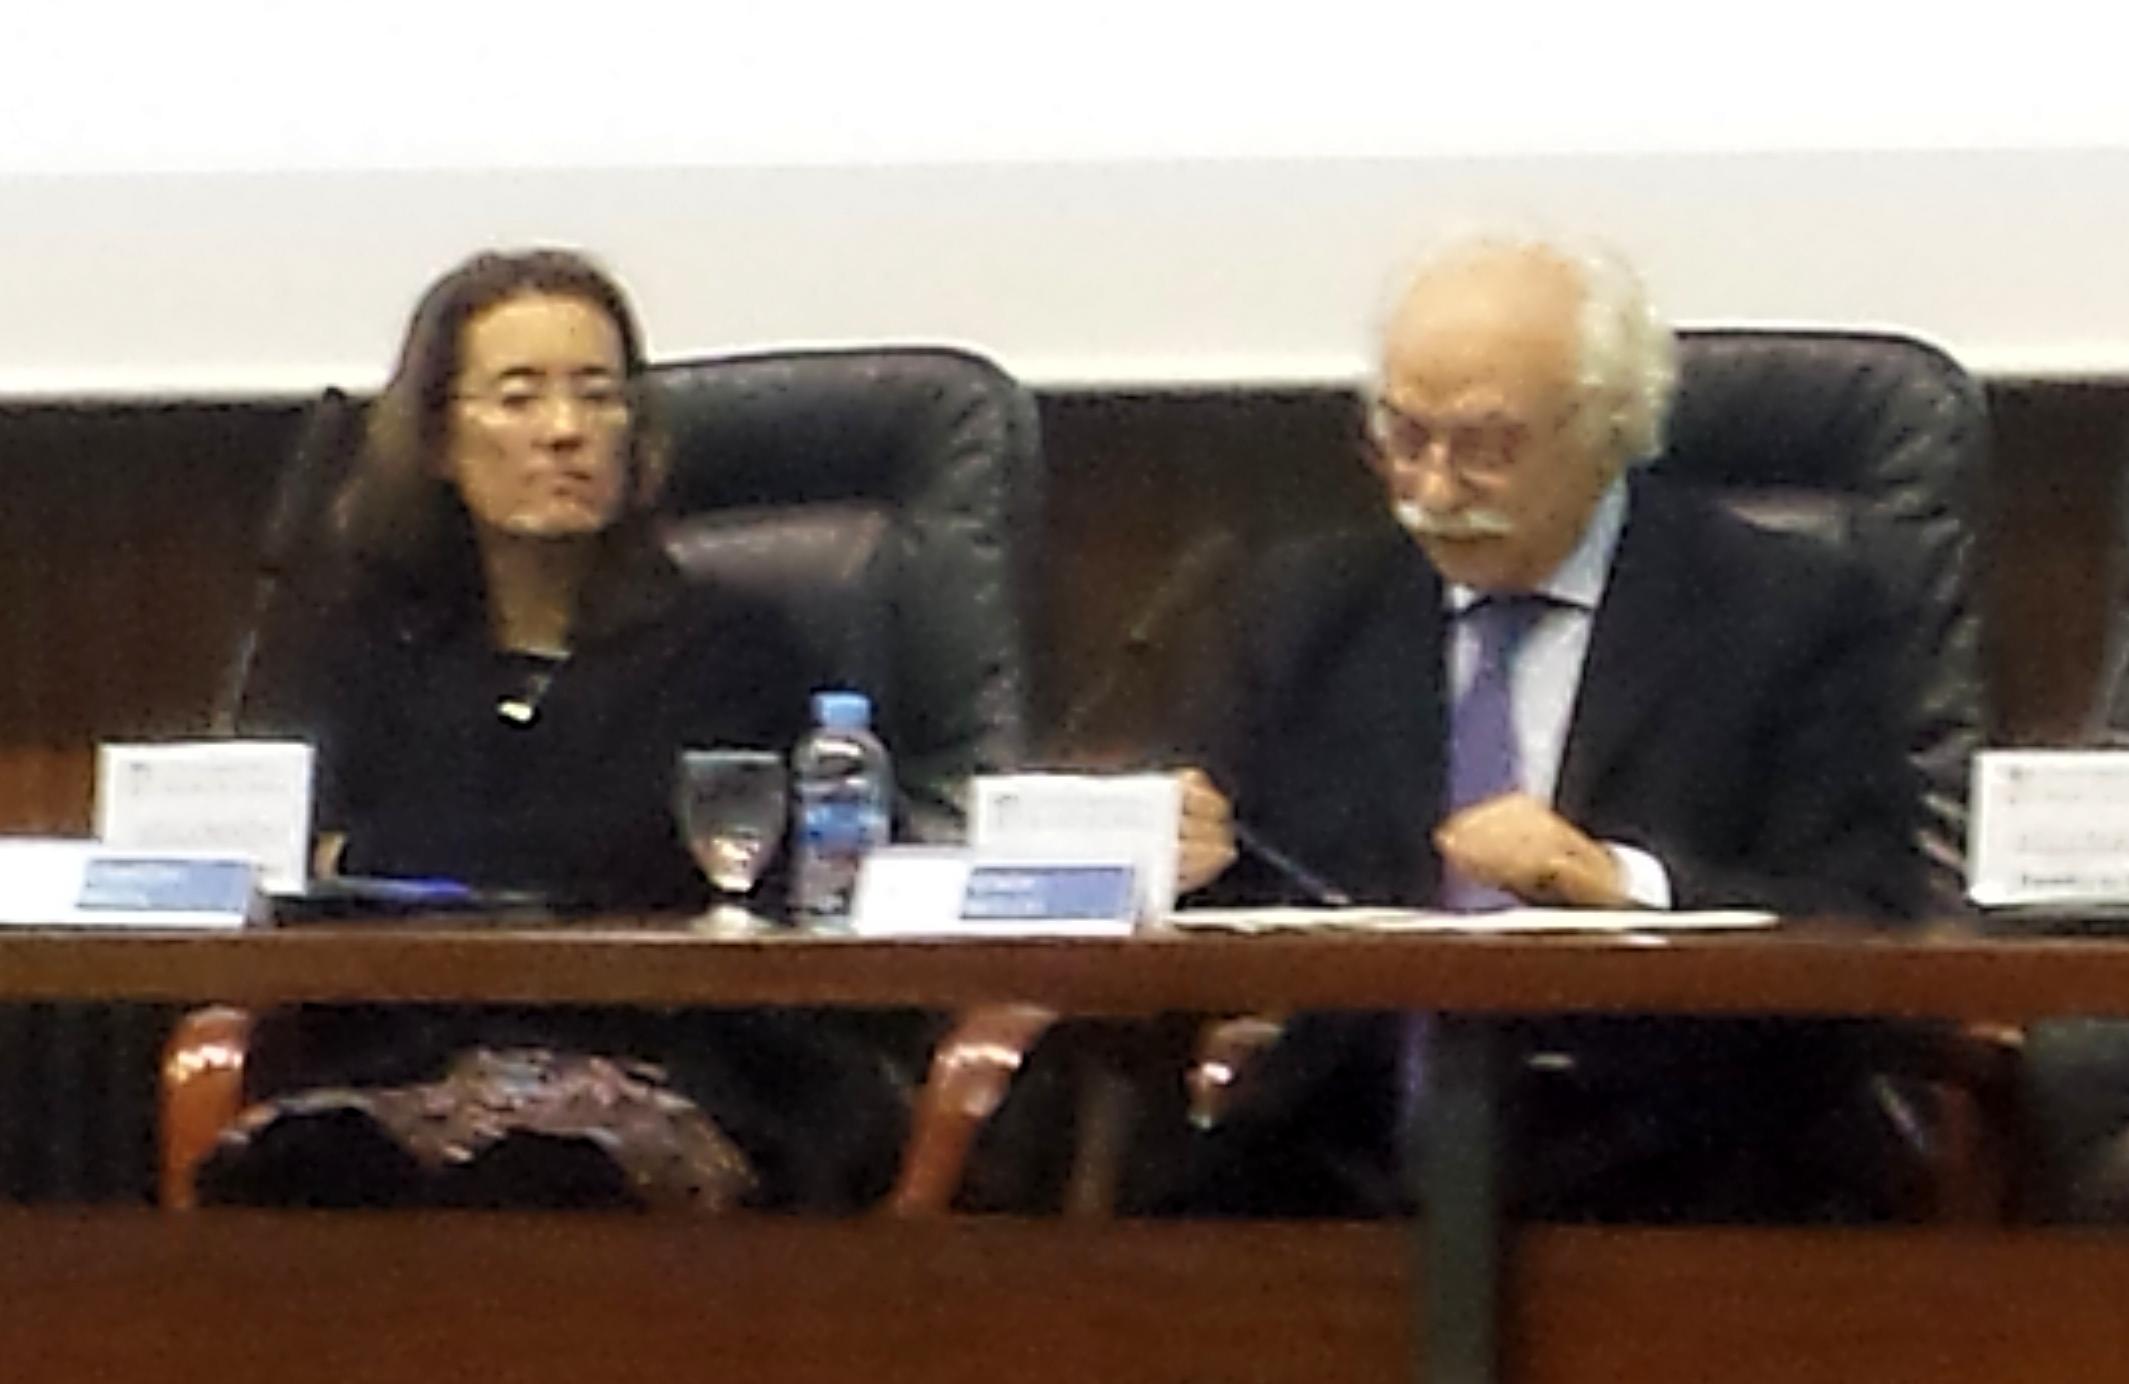 la Prof. Dra. Bolea Bardon (socia de la FICP) modera la ponencia del Prof. Dr. Sergio Moccia.